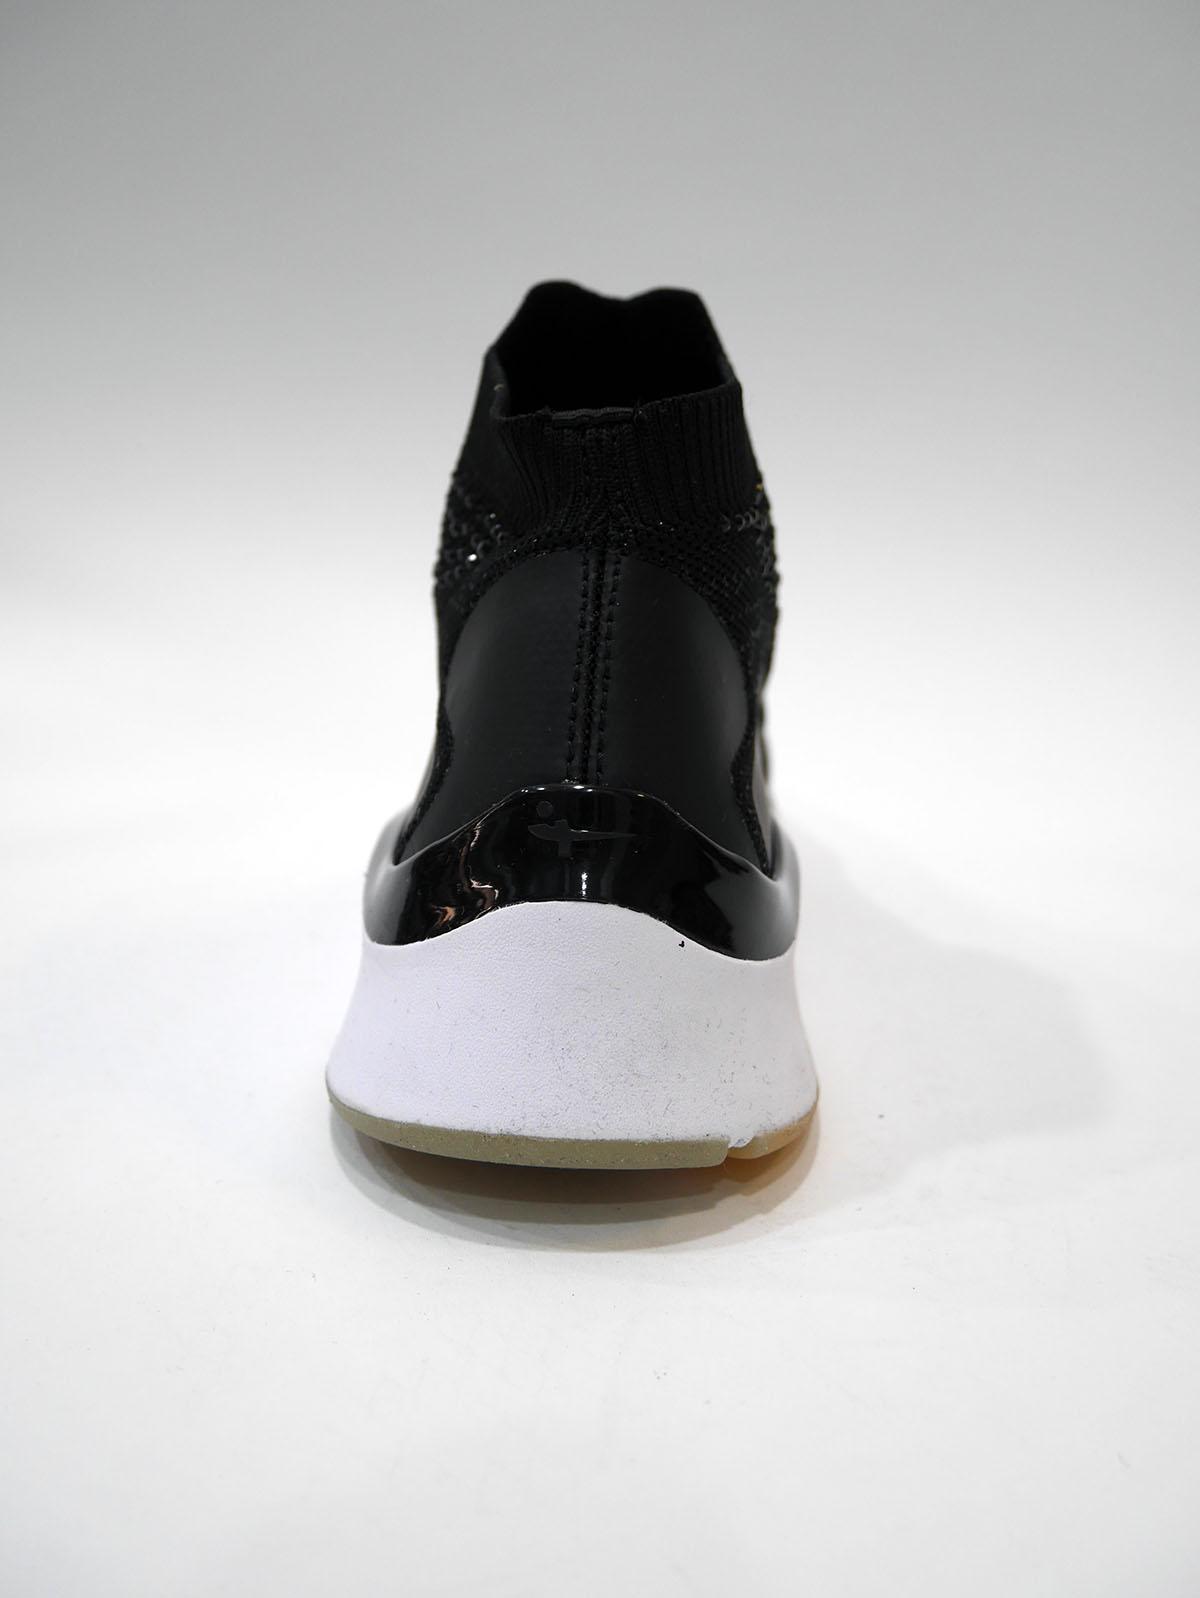 1-1-25403-22 029 BLACK CRYSTAL 5